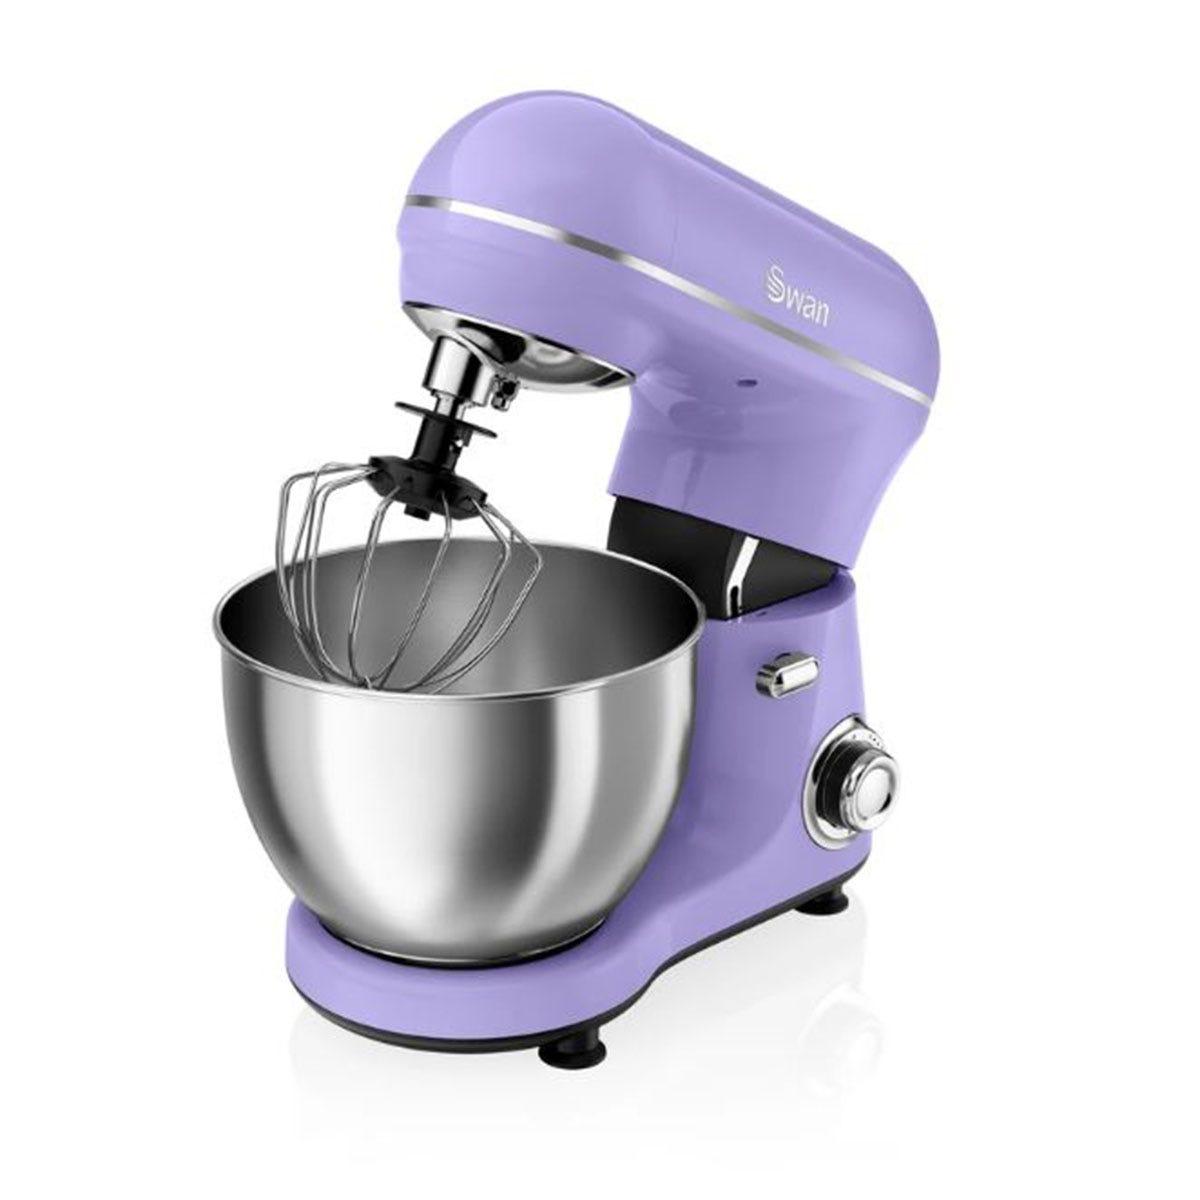 Swan SP21060PURN 800W Retro Stand Mixer - Purple